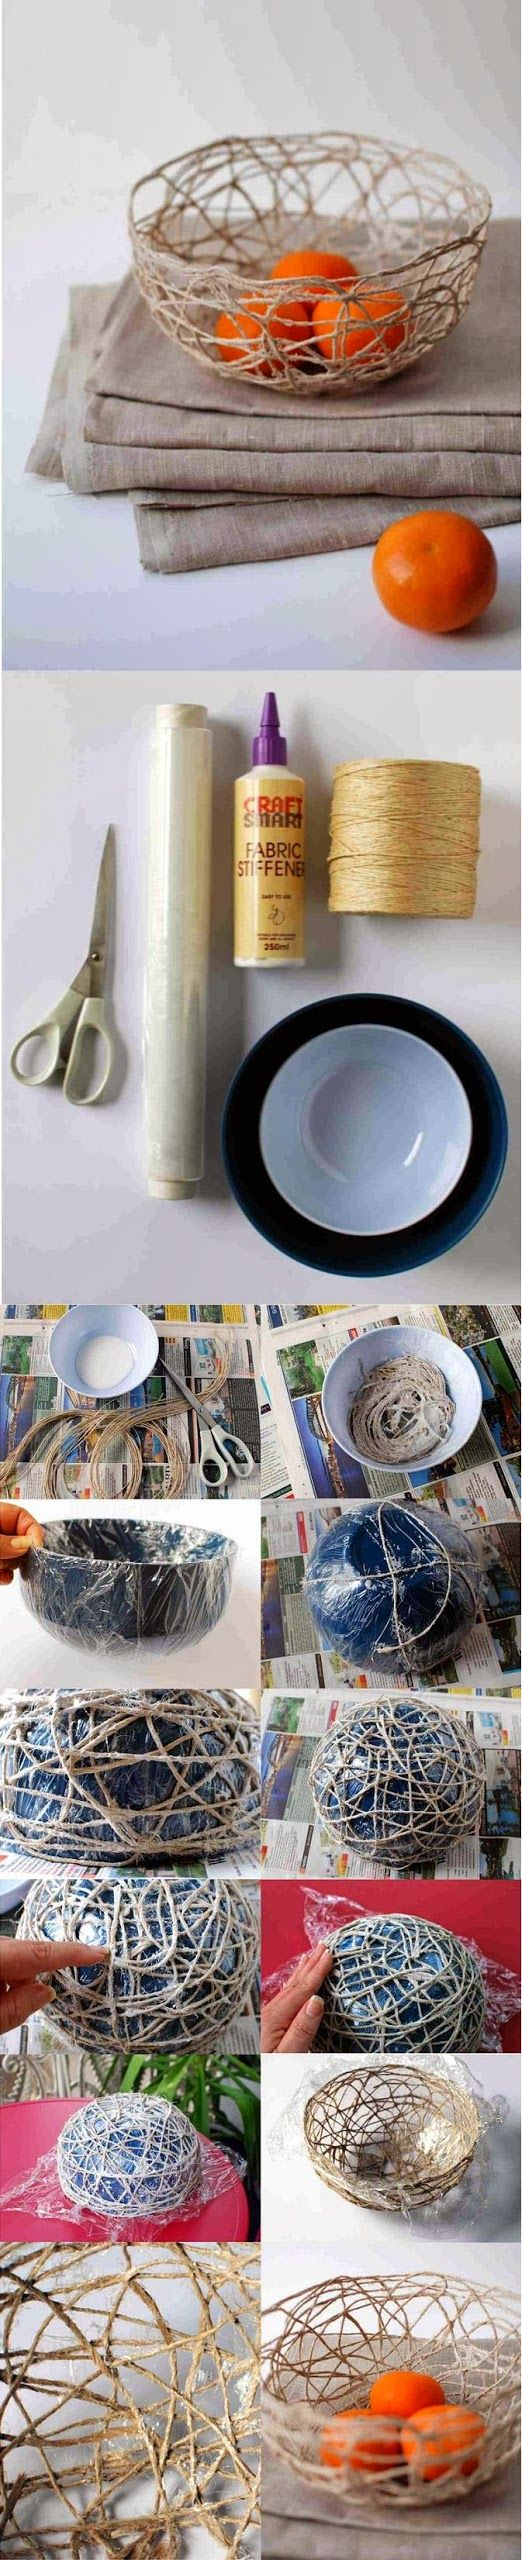 DIY : How to make a string bowl